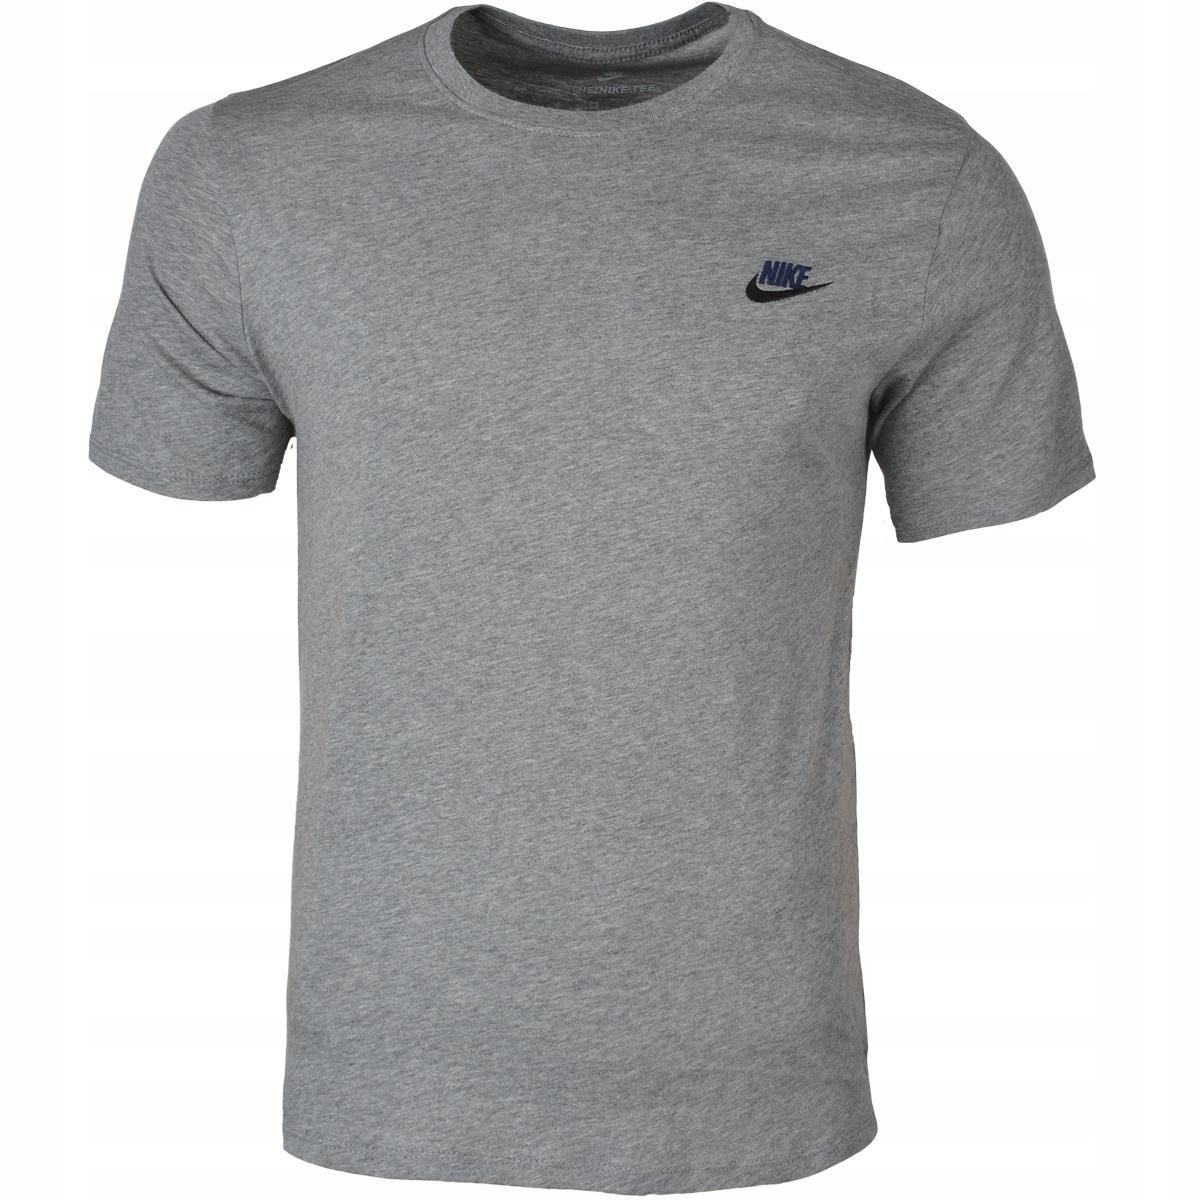 T-shirt NIKE Koszulka Męska (827021-092) M